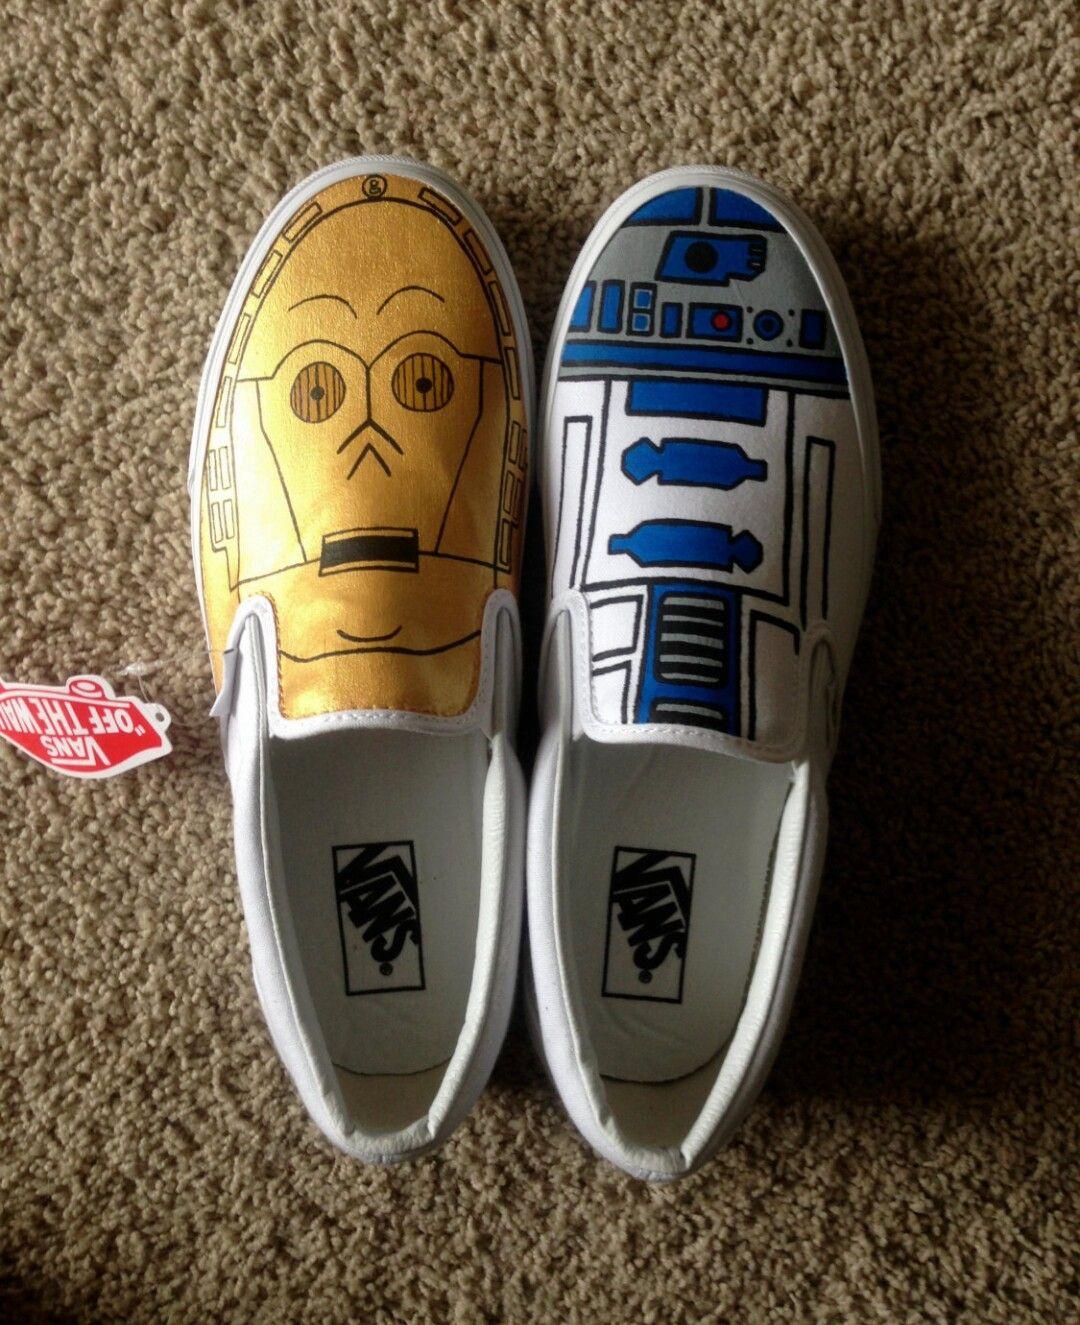 51e4408572 C3PO   R2D2 Star Wars Vans